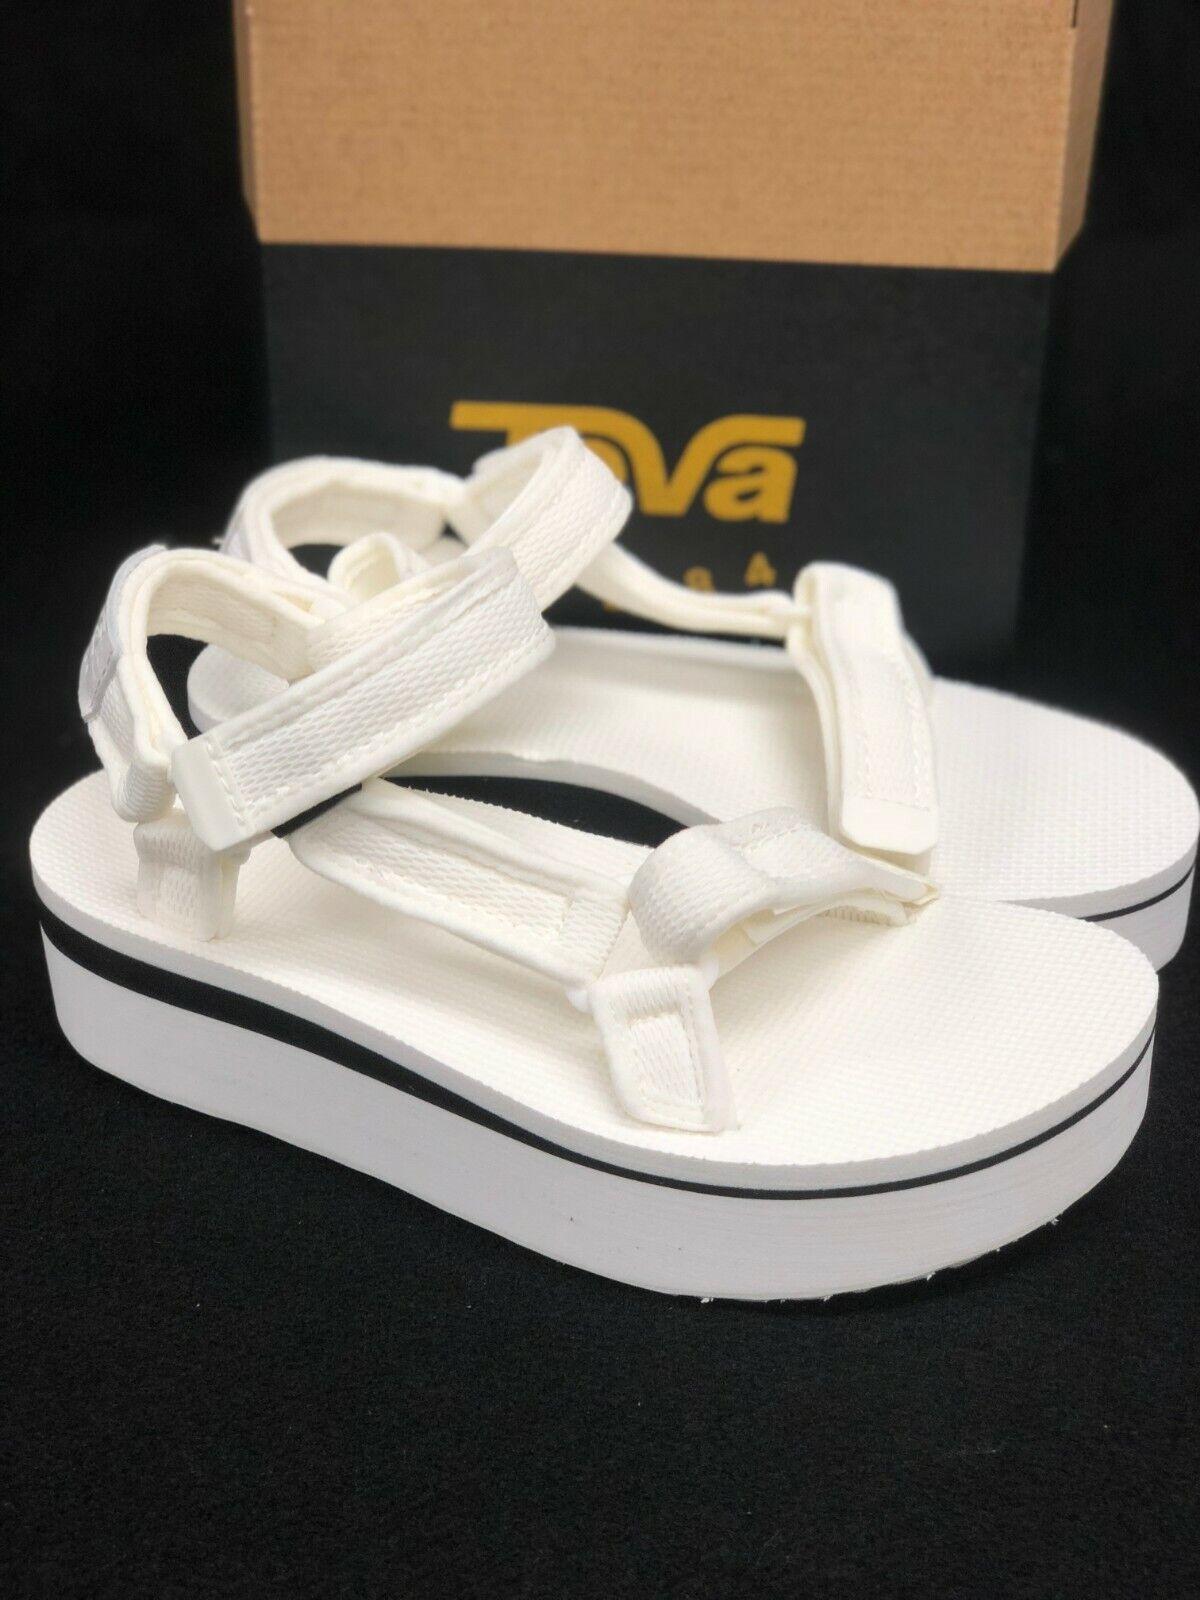 Teva Women's Flatform Universal Mesh Print Platform Sandals Bright White 1102451 1